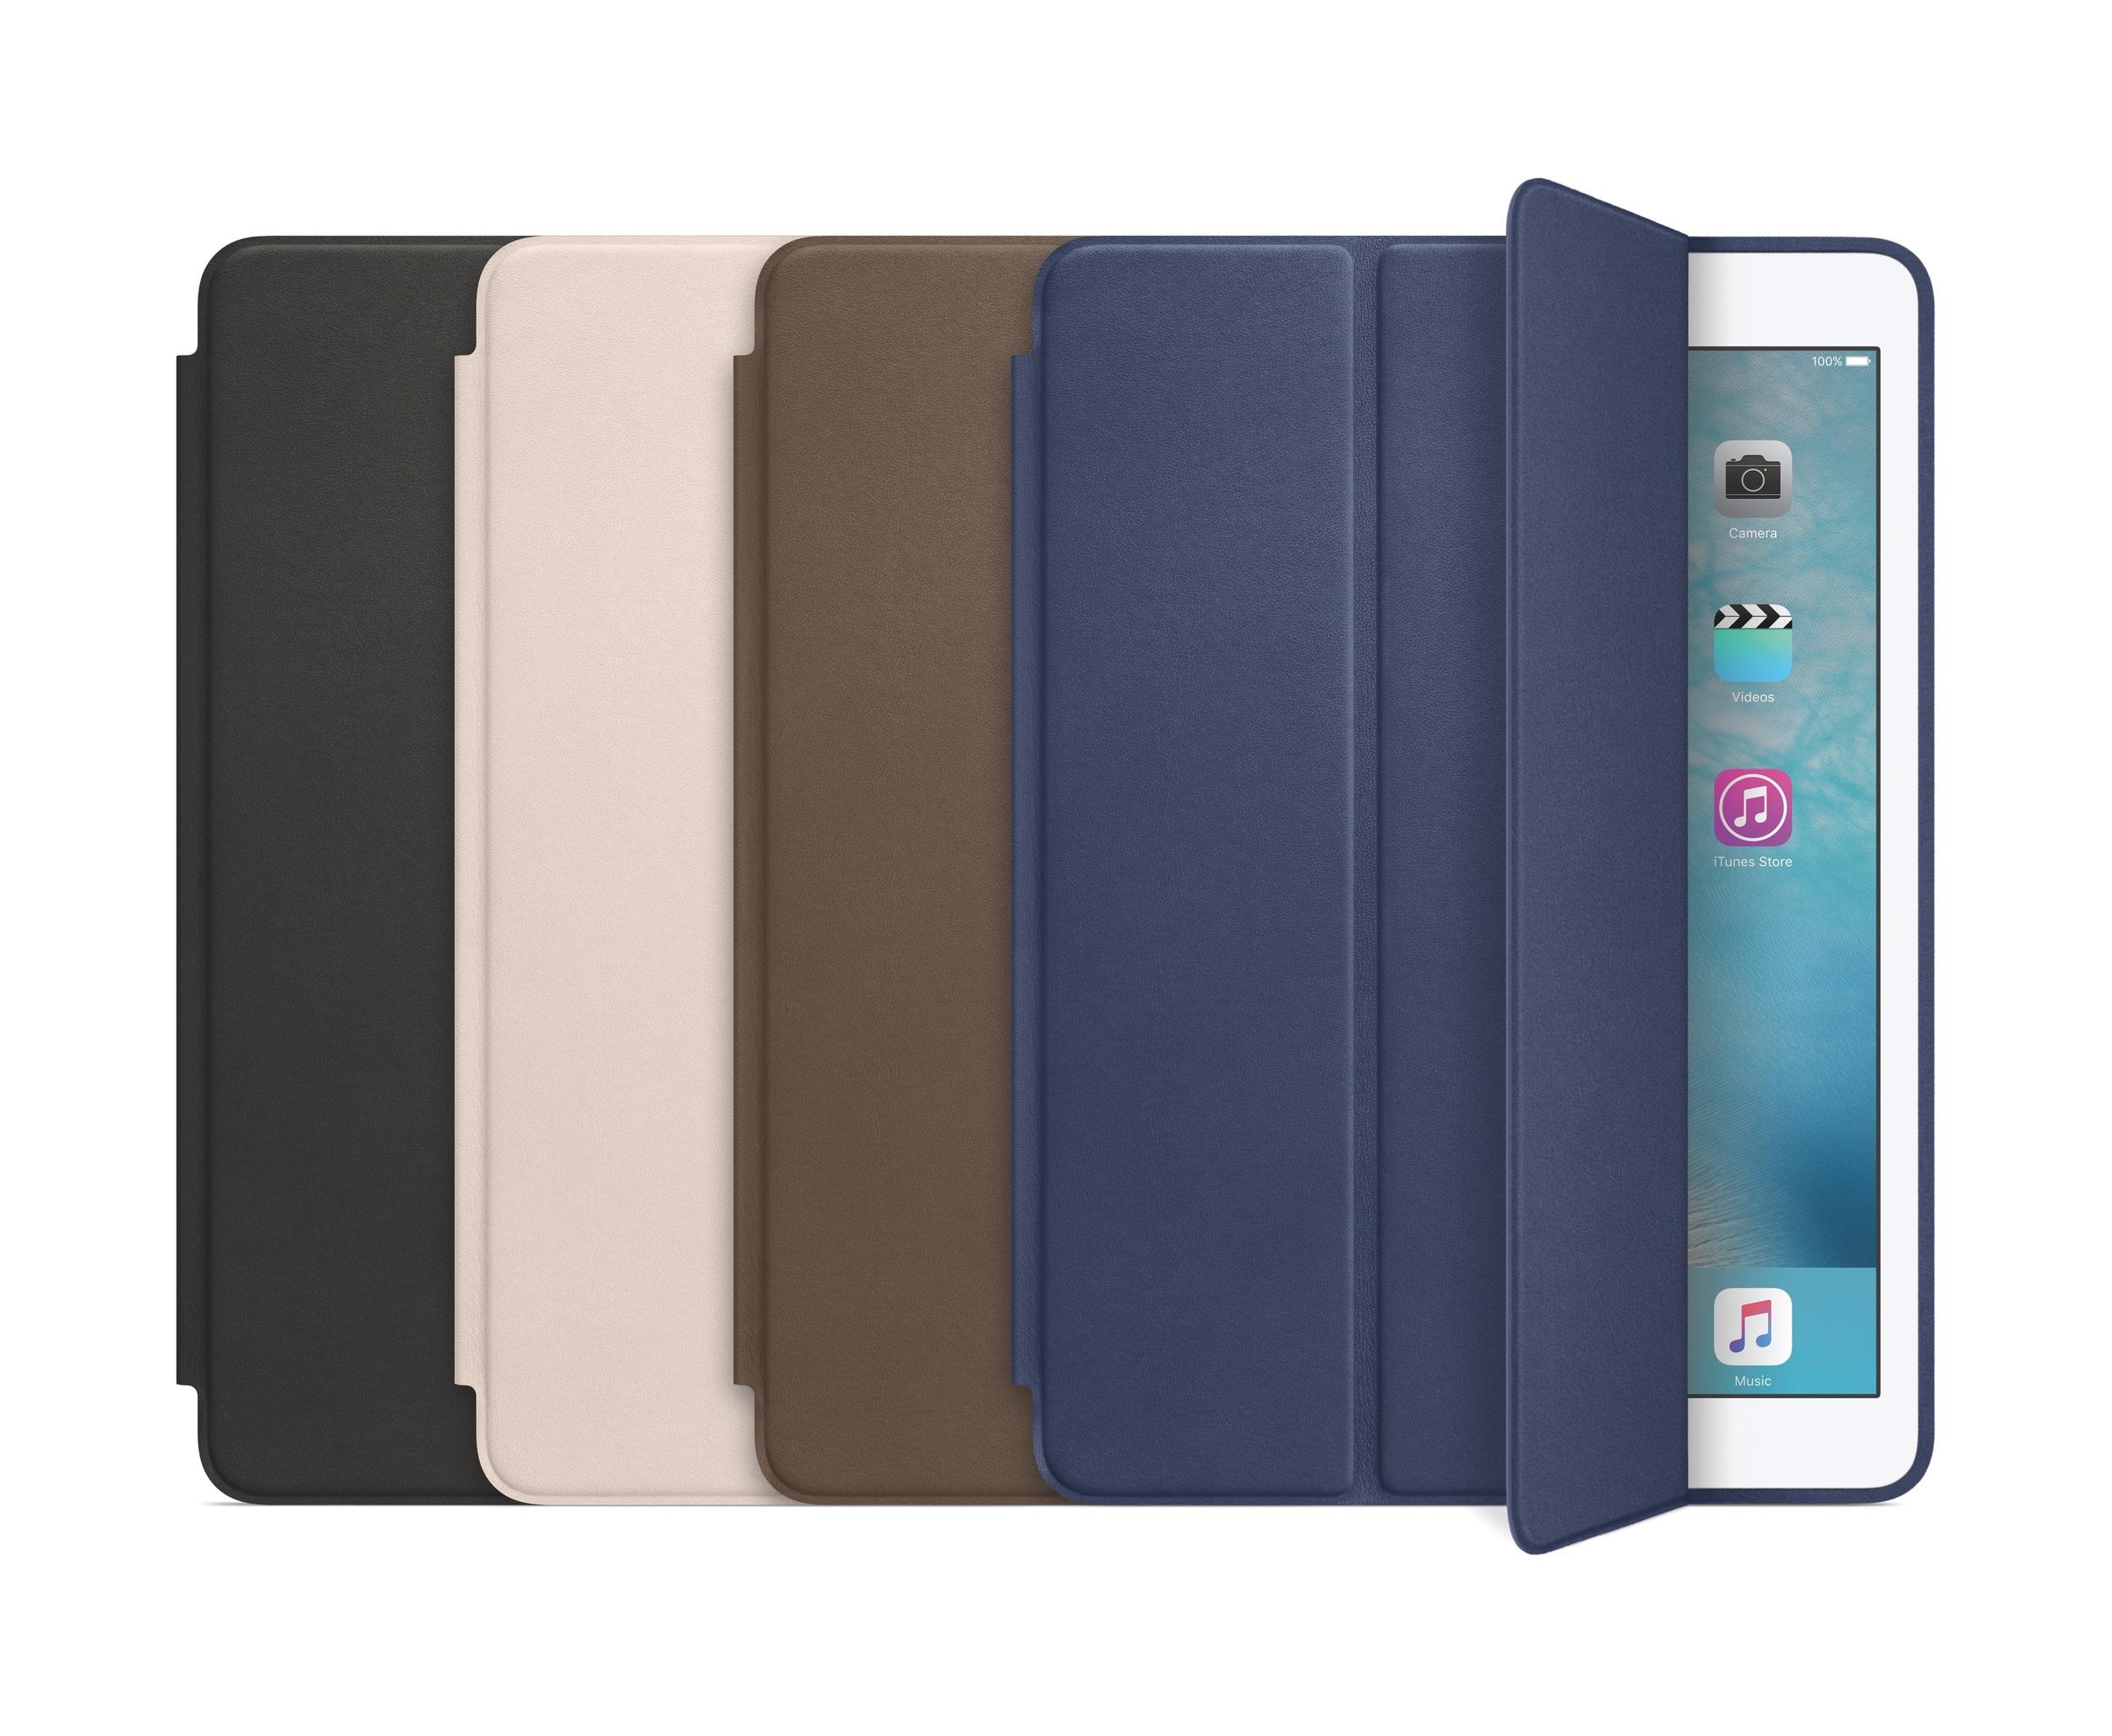 iPadAir2_SmartCase_Family_Lthr_WW-EN-PRINT.tif.jpeg